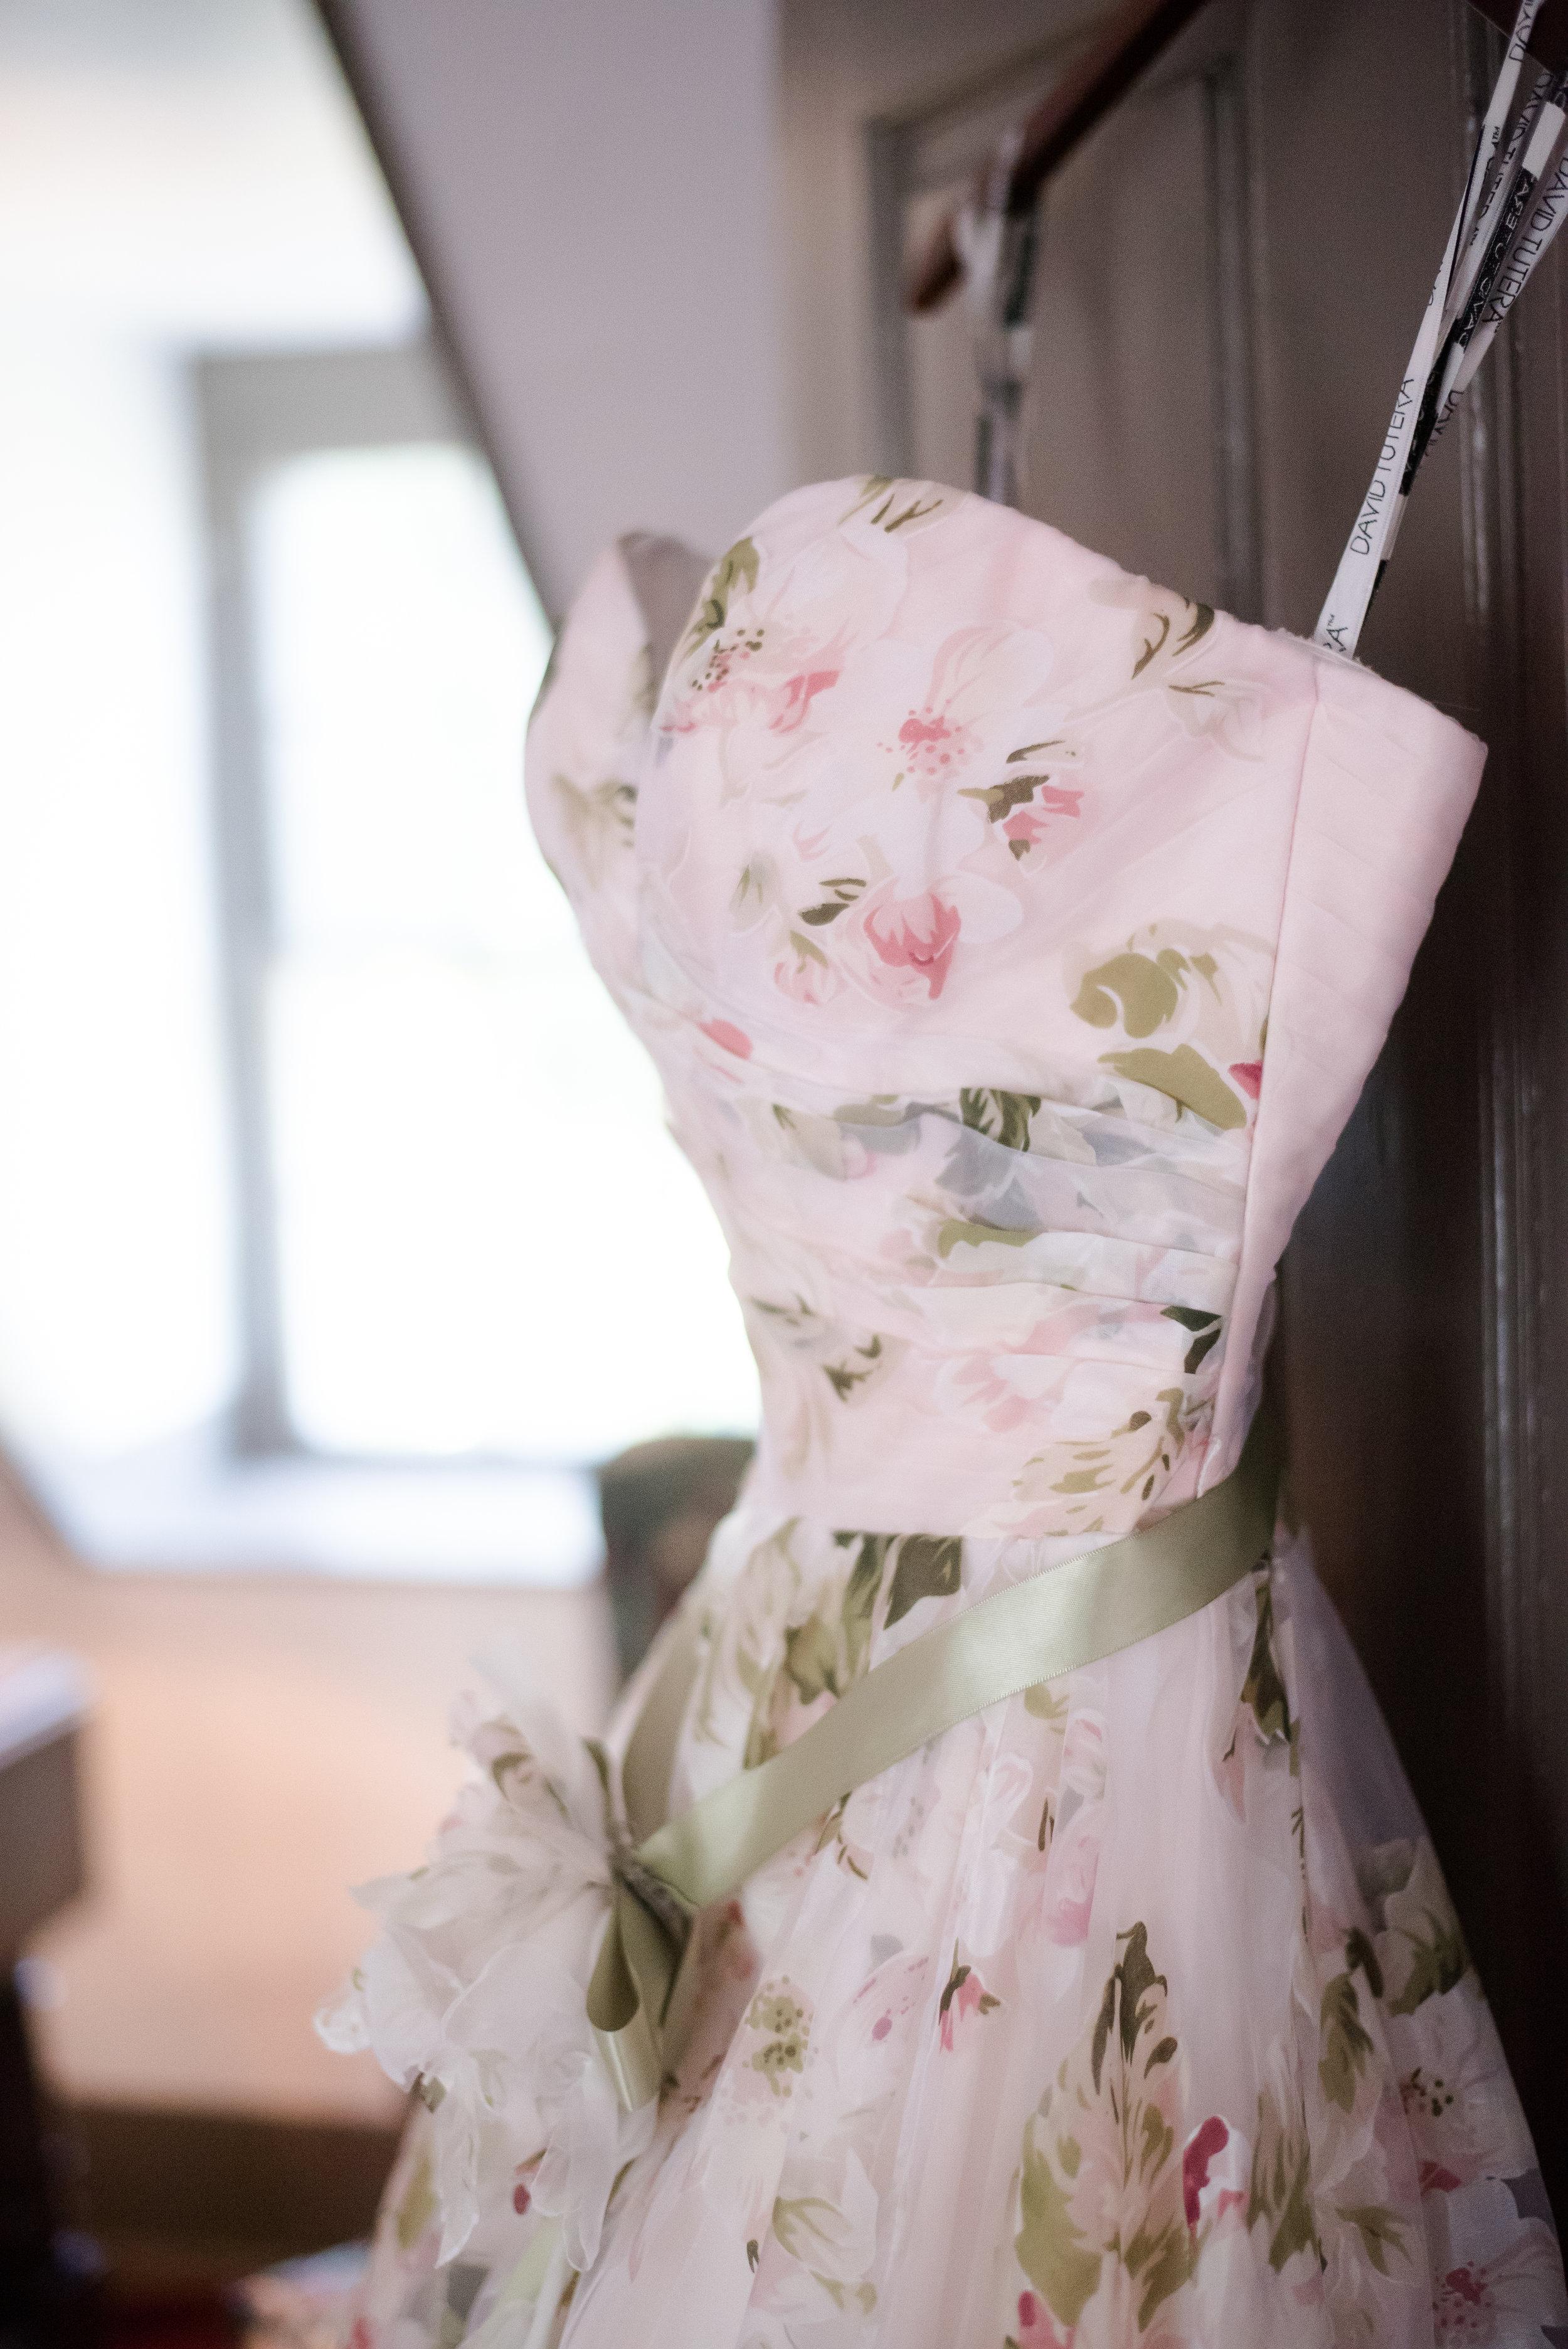 midsummers-eve-wedding-floral-blush-dress-david-tutera-cary-hill-plantation-photo-virginia-bride-12.jpg